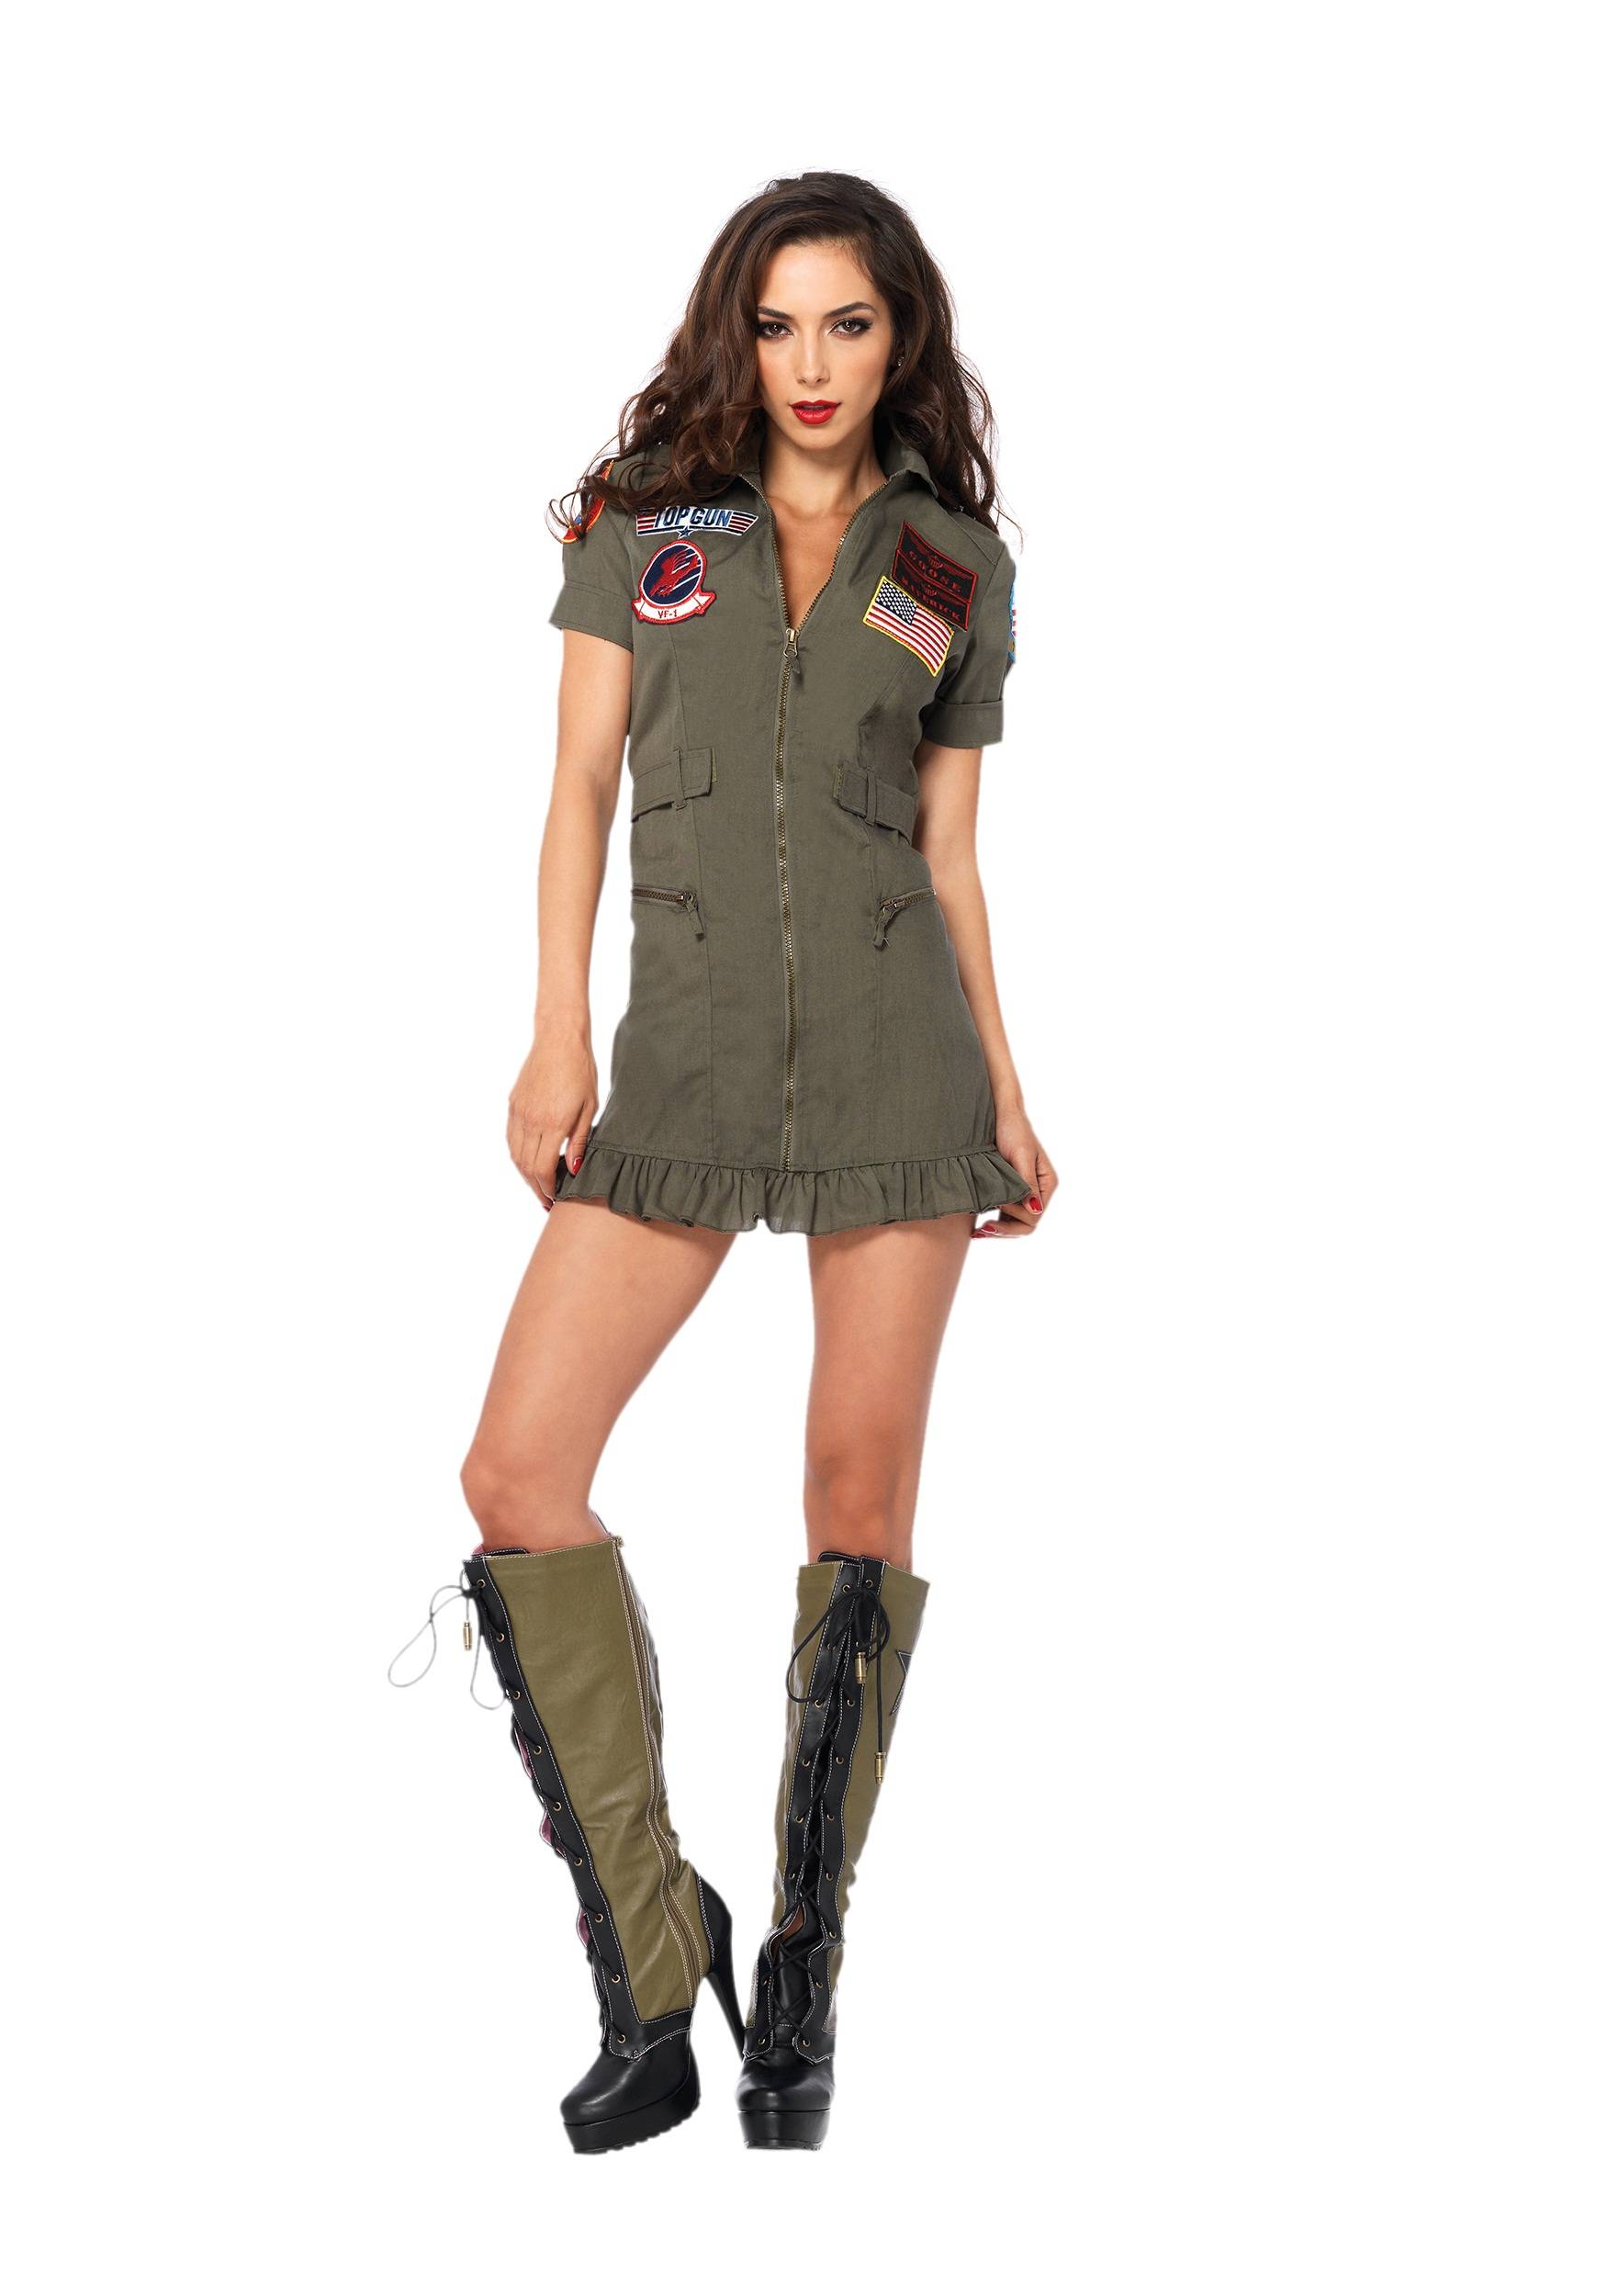 plus size sexy top gun costume